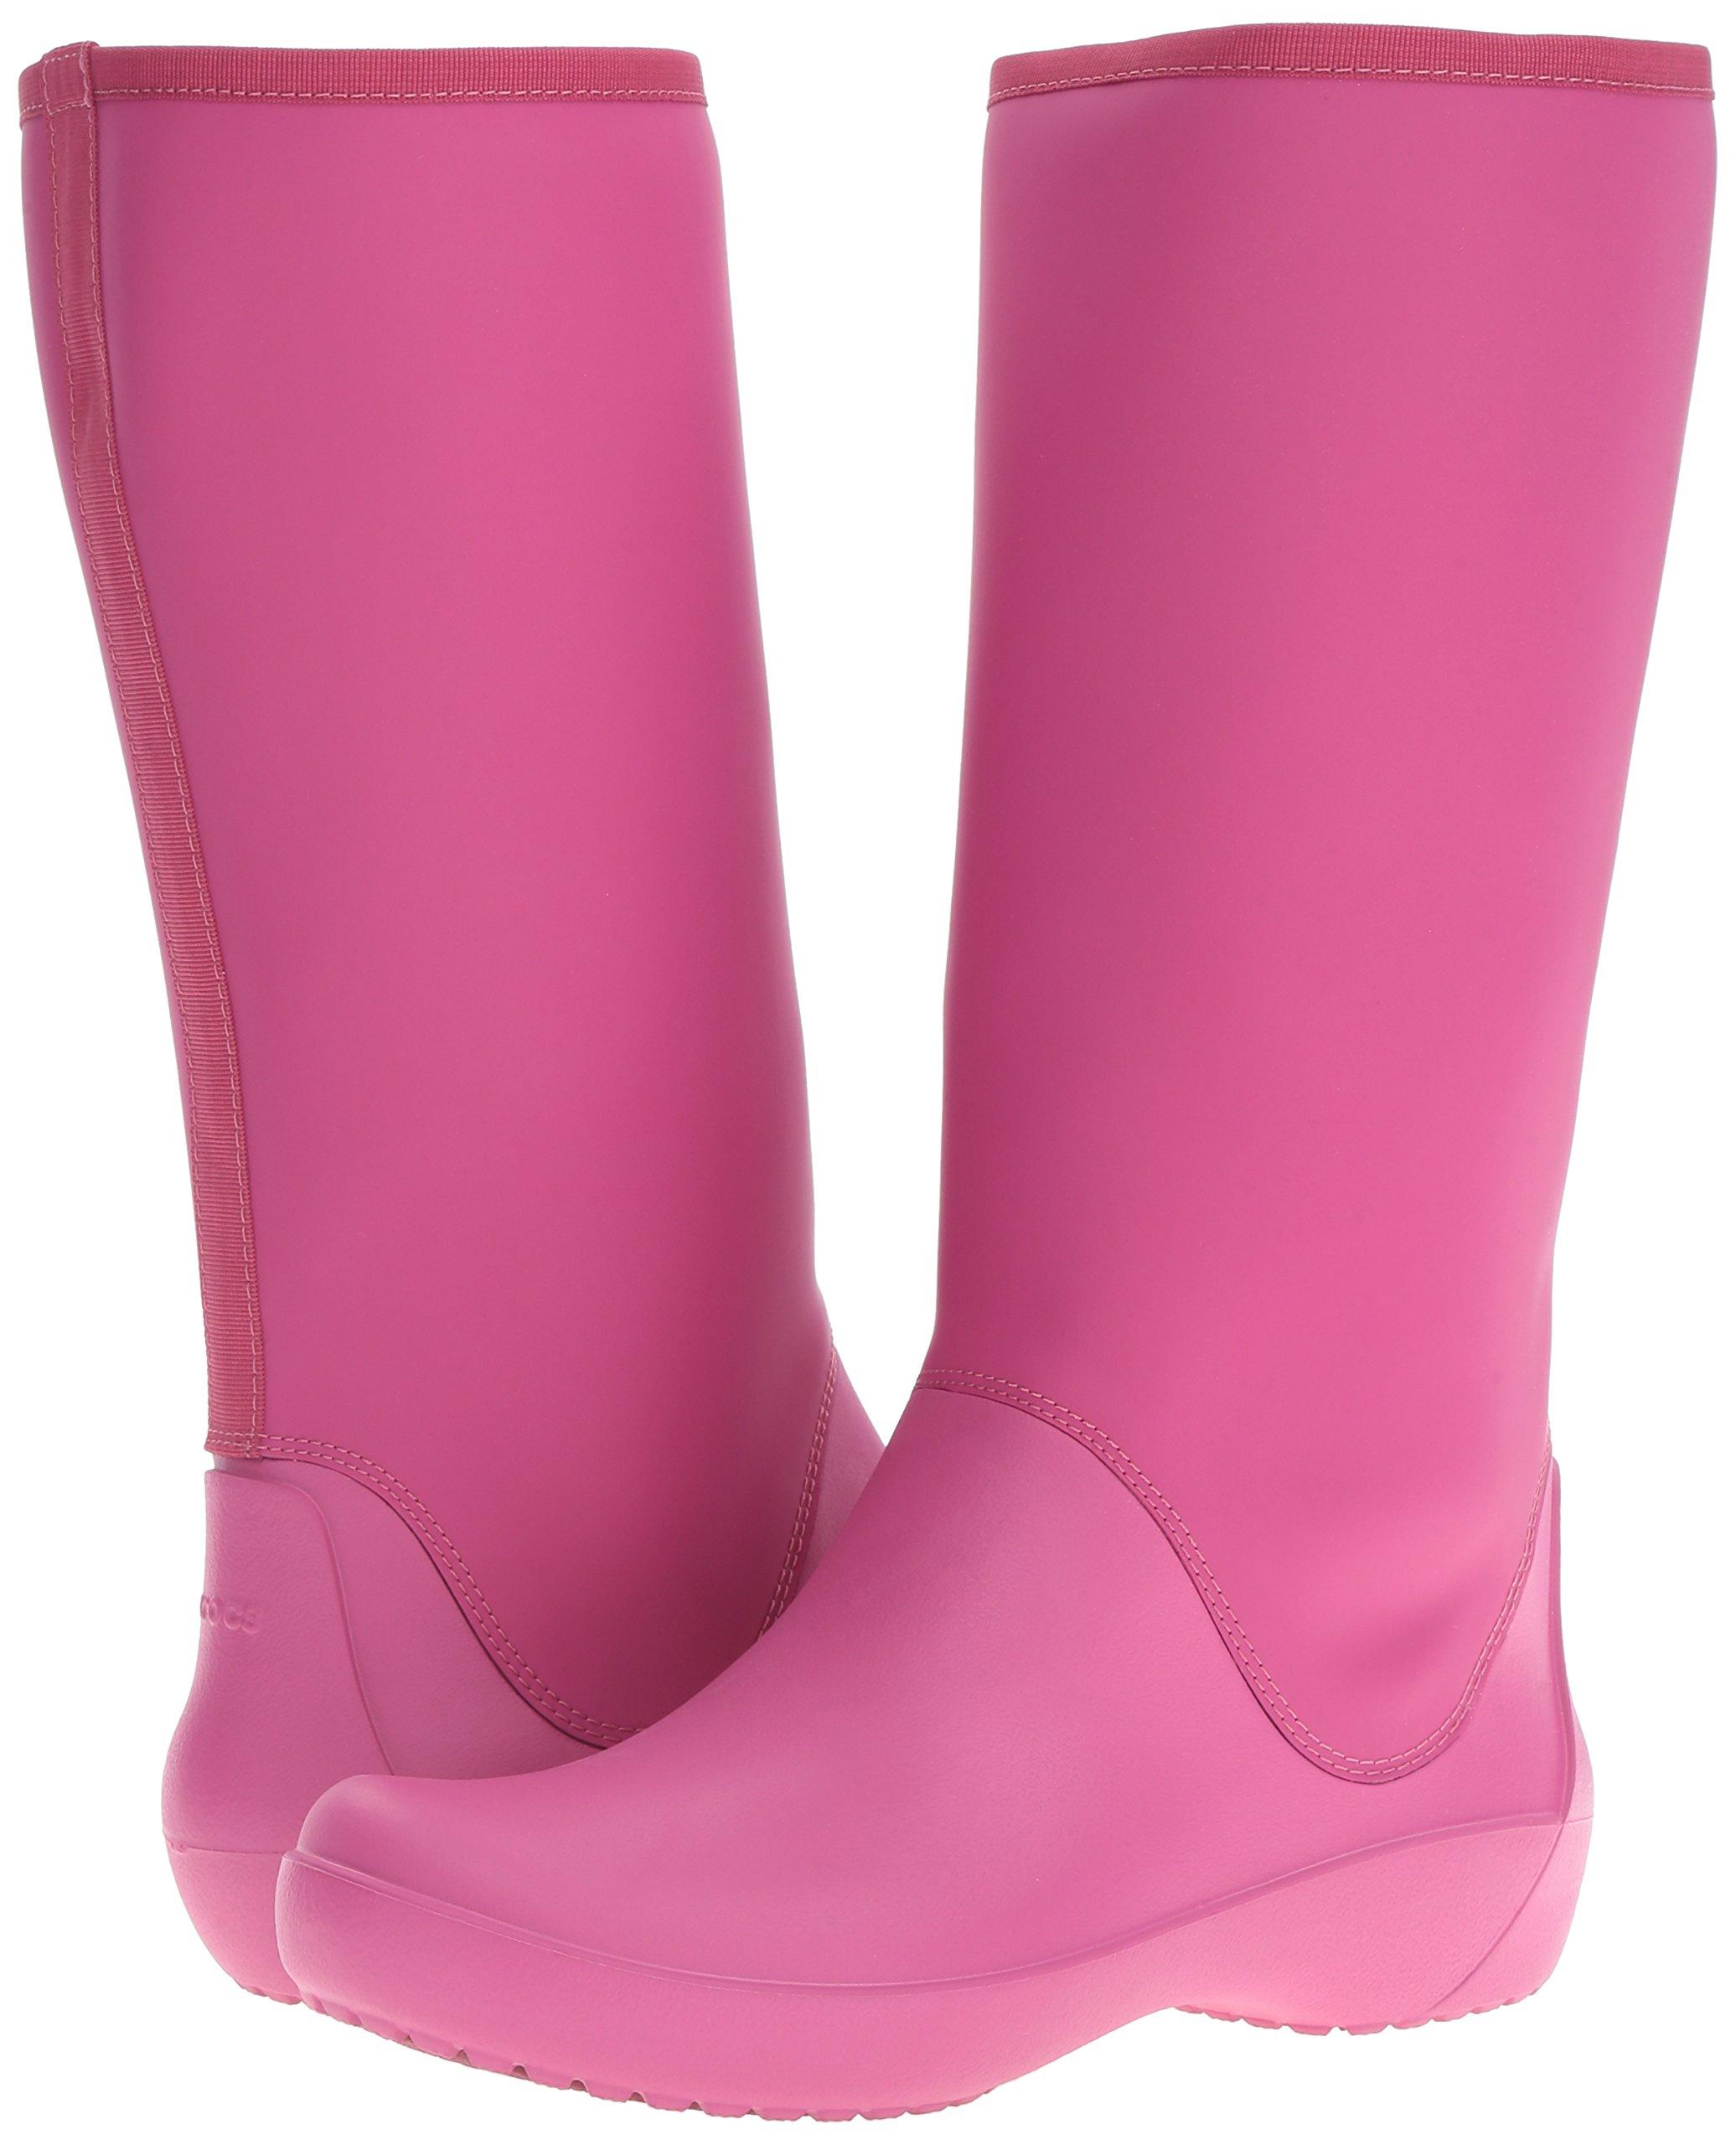 Crocs Women's Rain Floe Tall Boot, Berry, 7 M US by Crocs (Image #6)